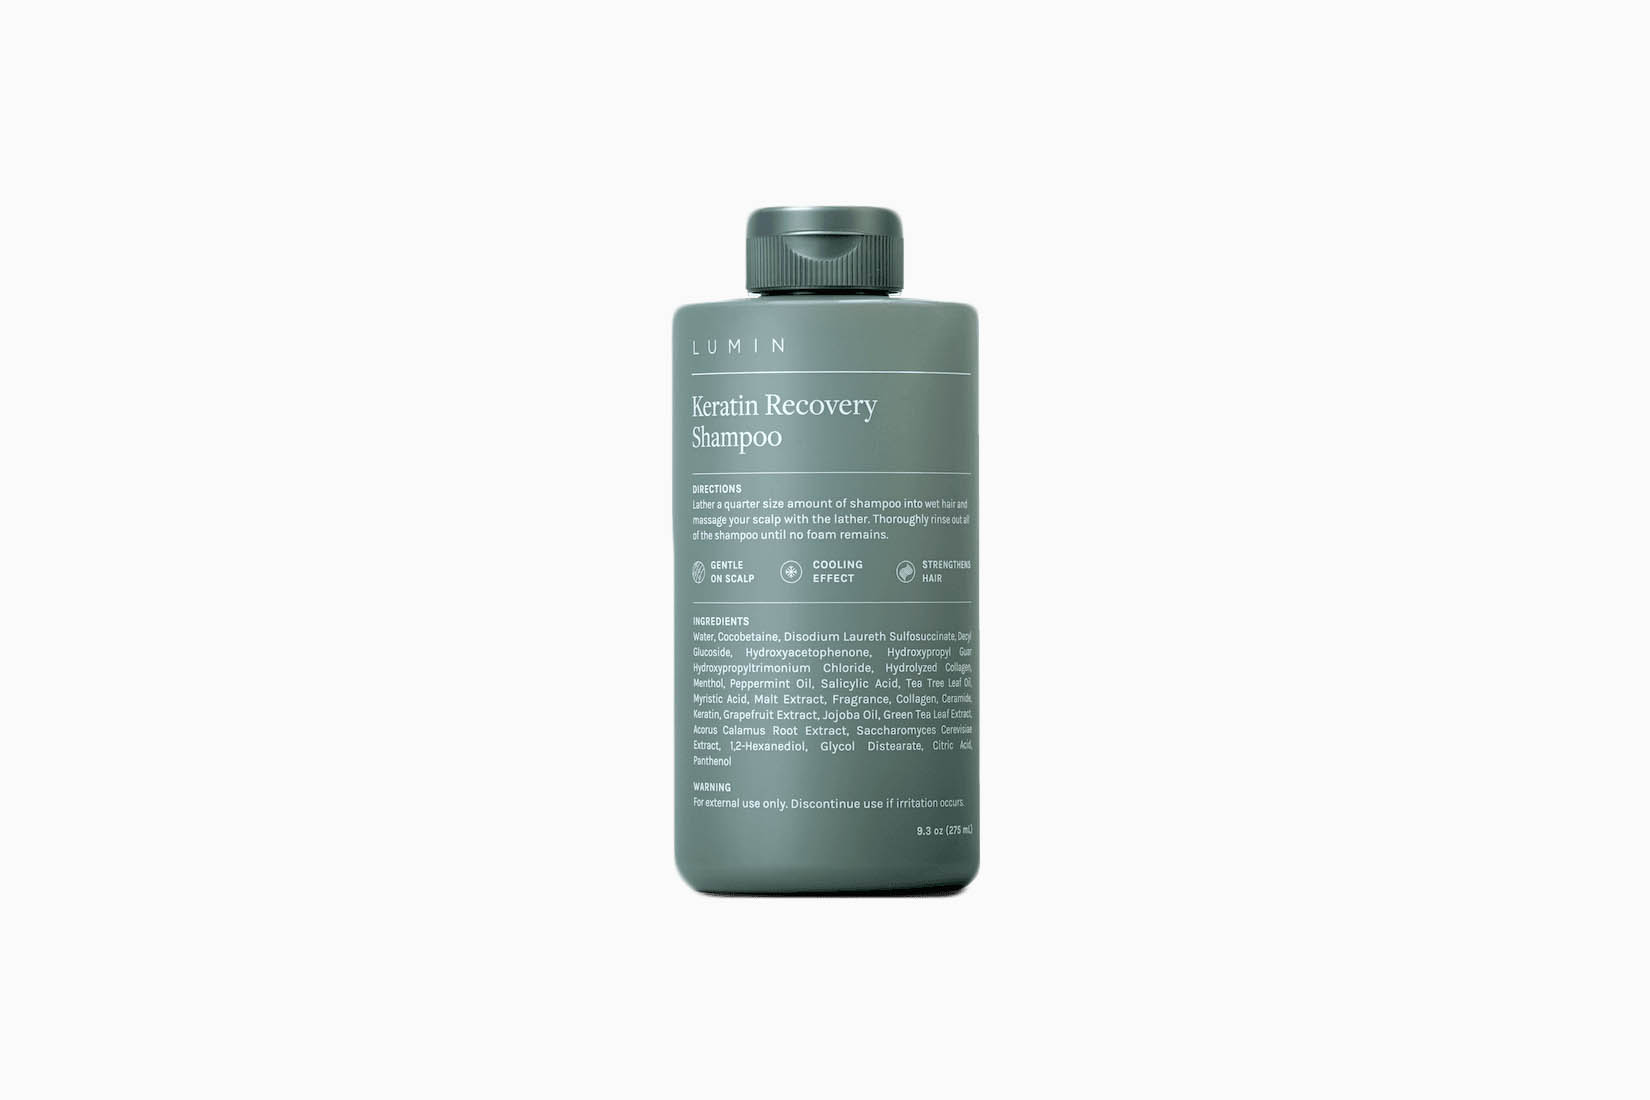 Best Hair Loss Shampoo Men Keratin Review - Luxe Digital